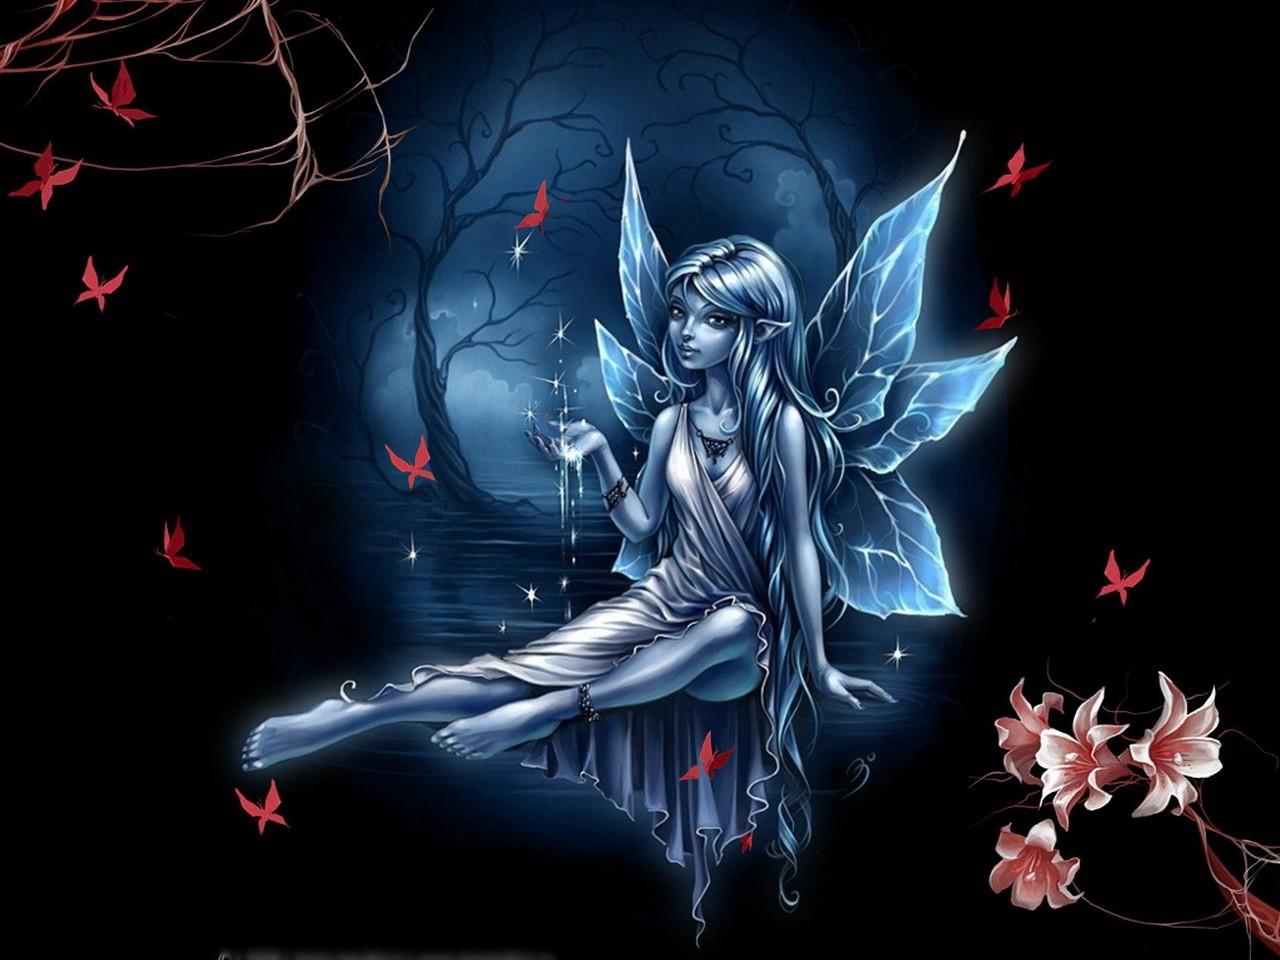 desktop wallpaper fairies - photo #24